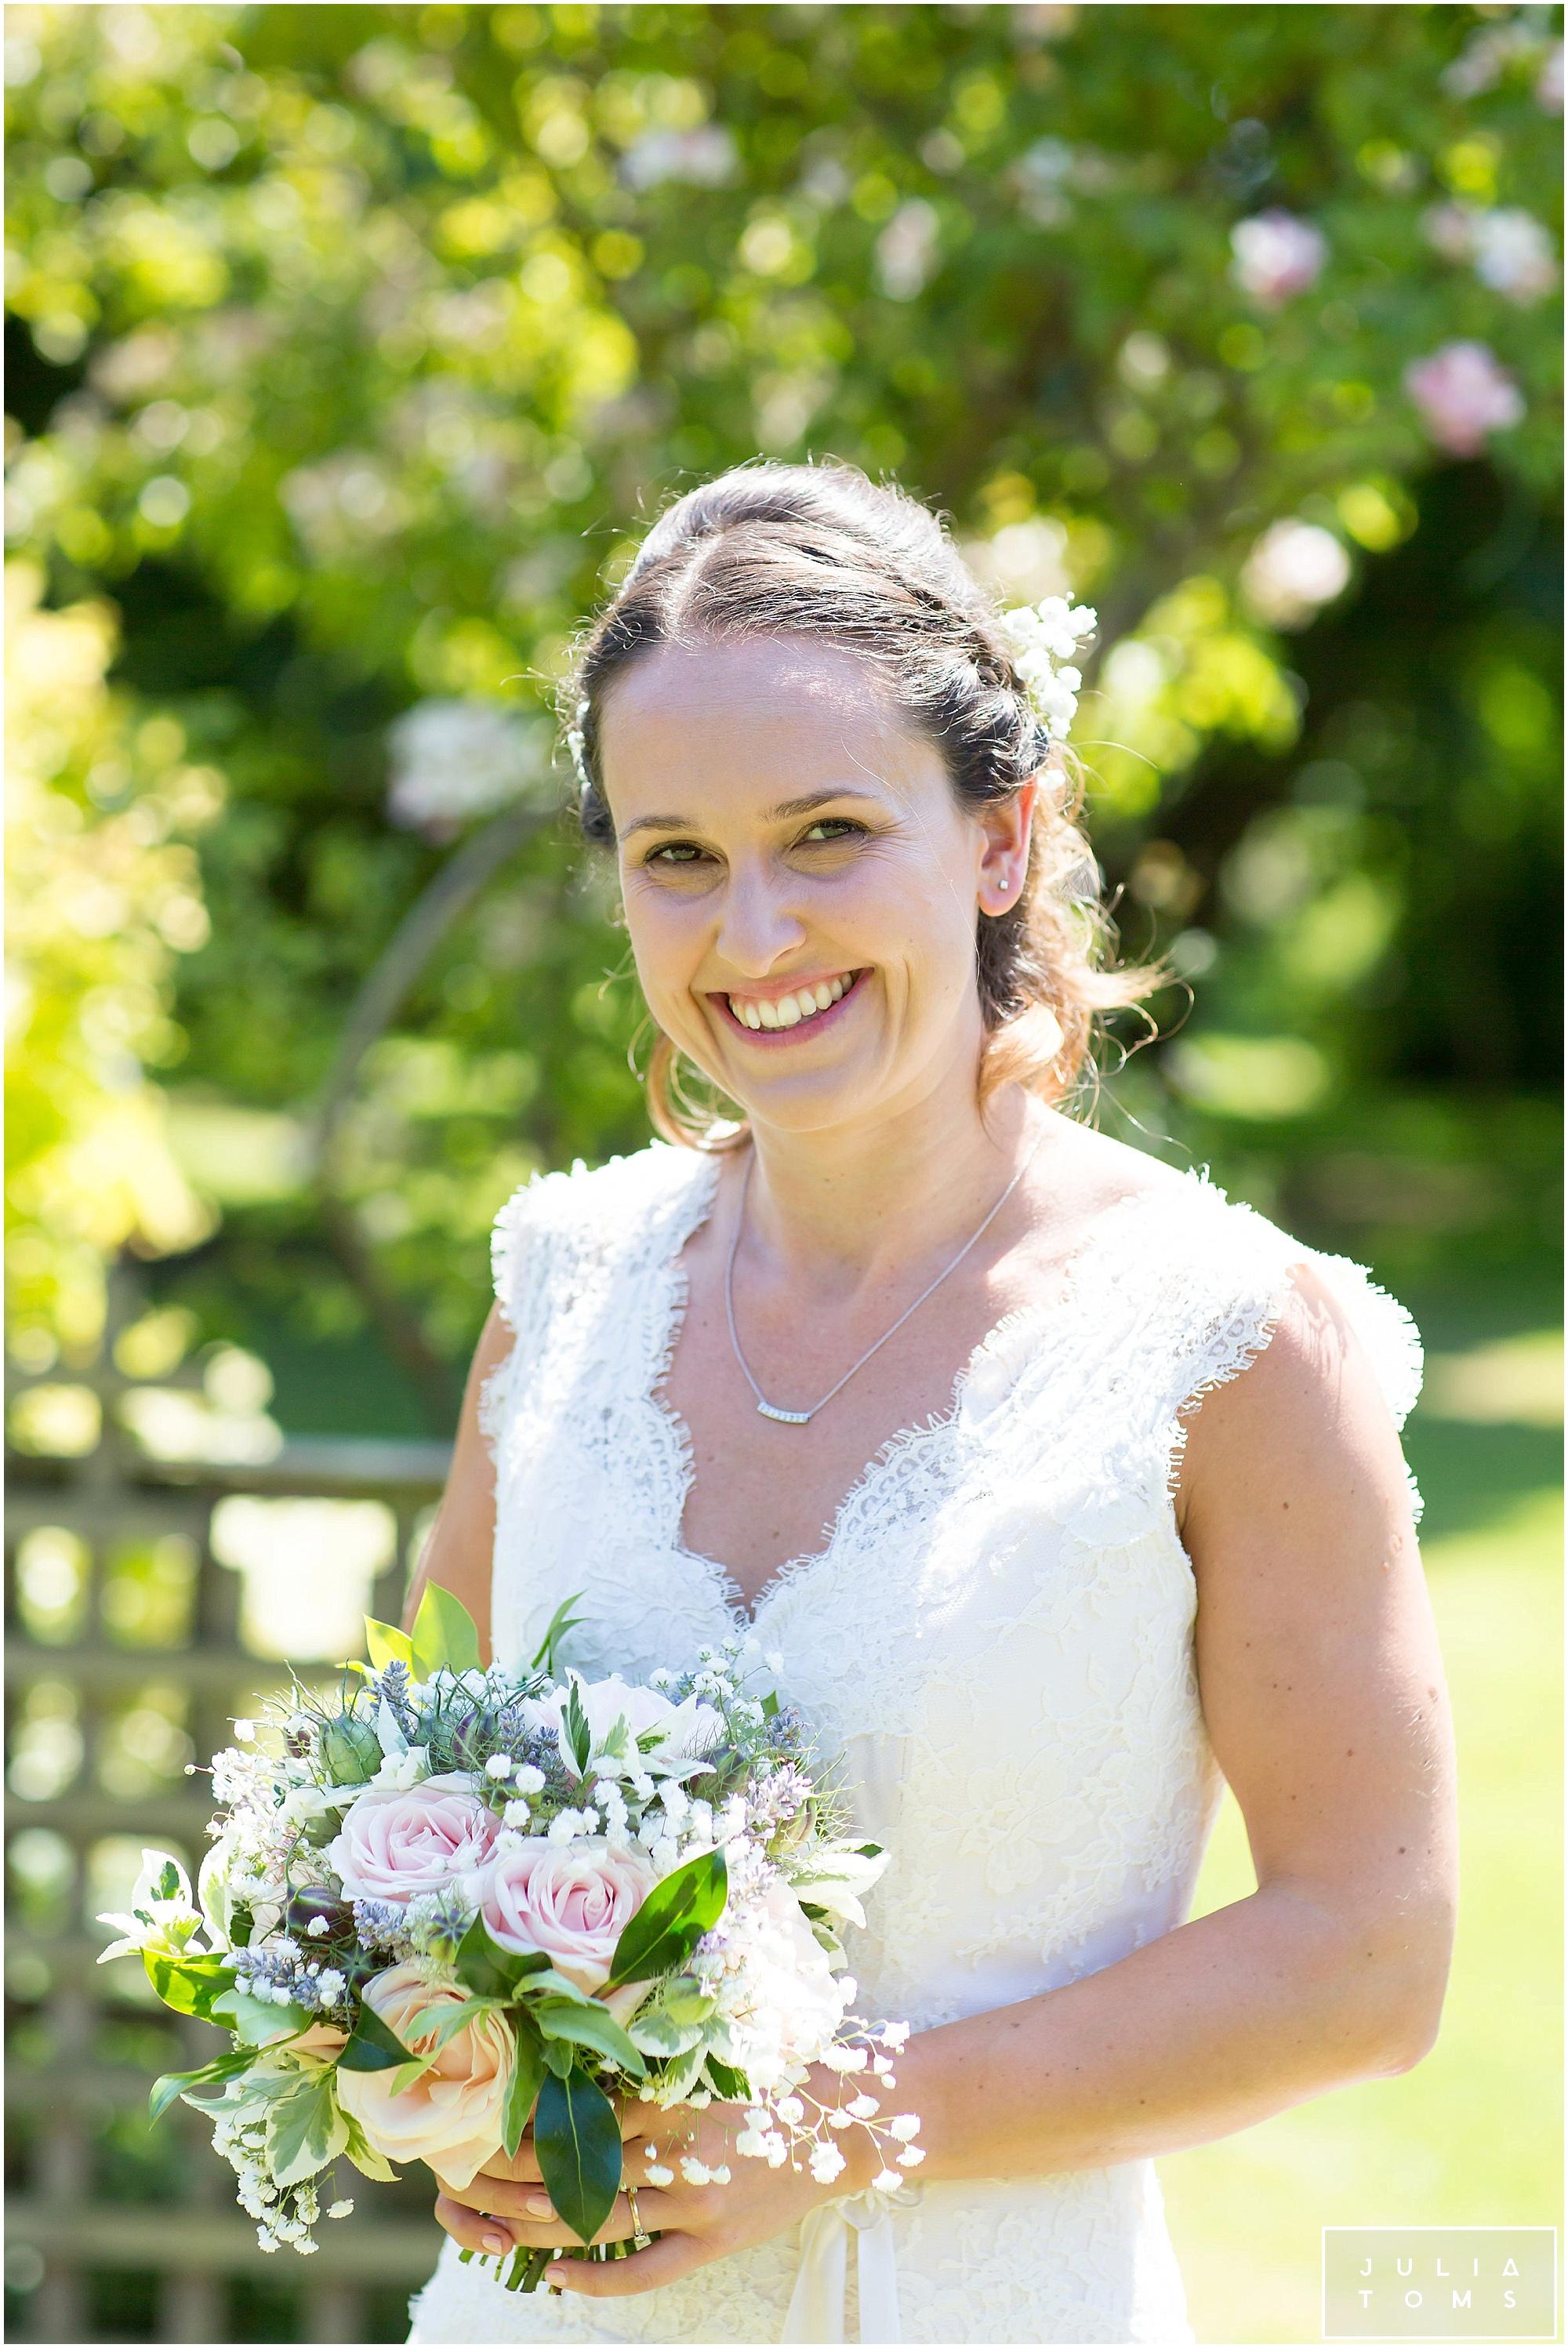 julia_toms_chichester_wedding_photographer_portsmouth_015.jpg